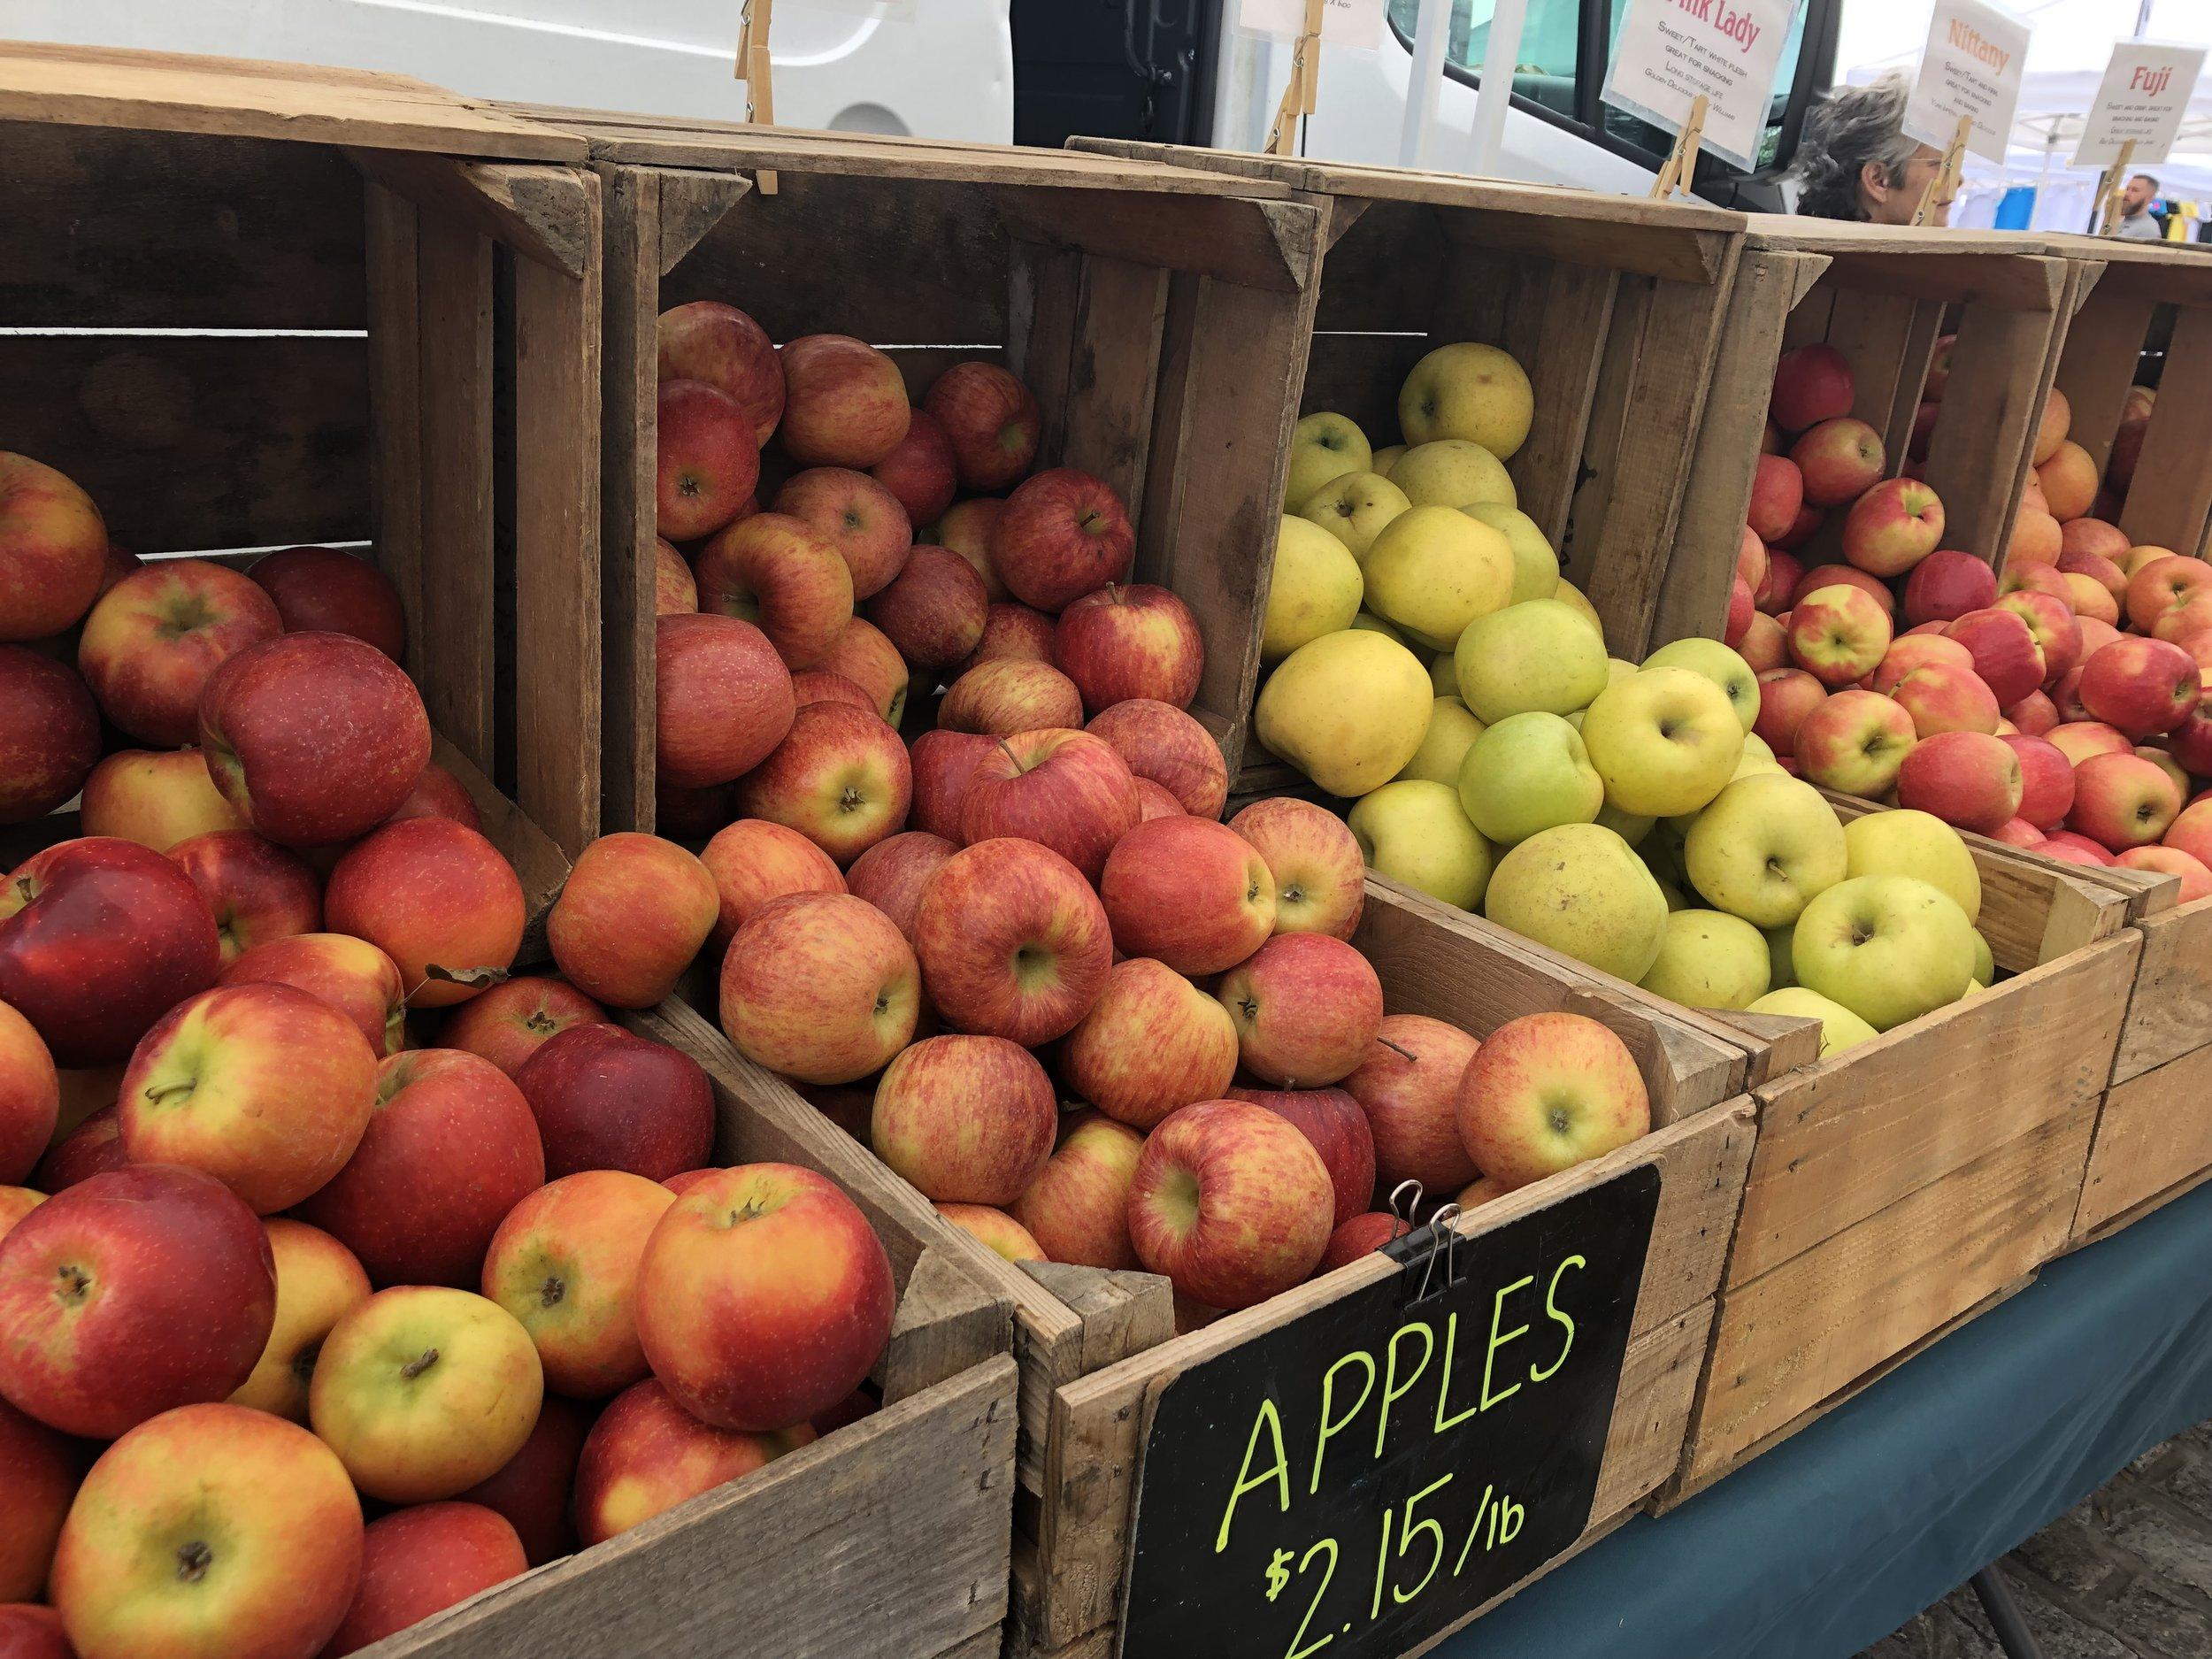 Fells-Point-Farmers-Market-apples.jpg